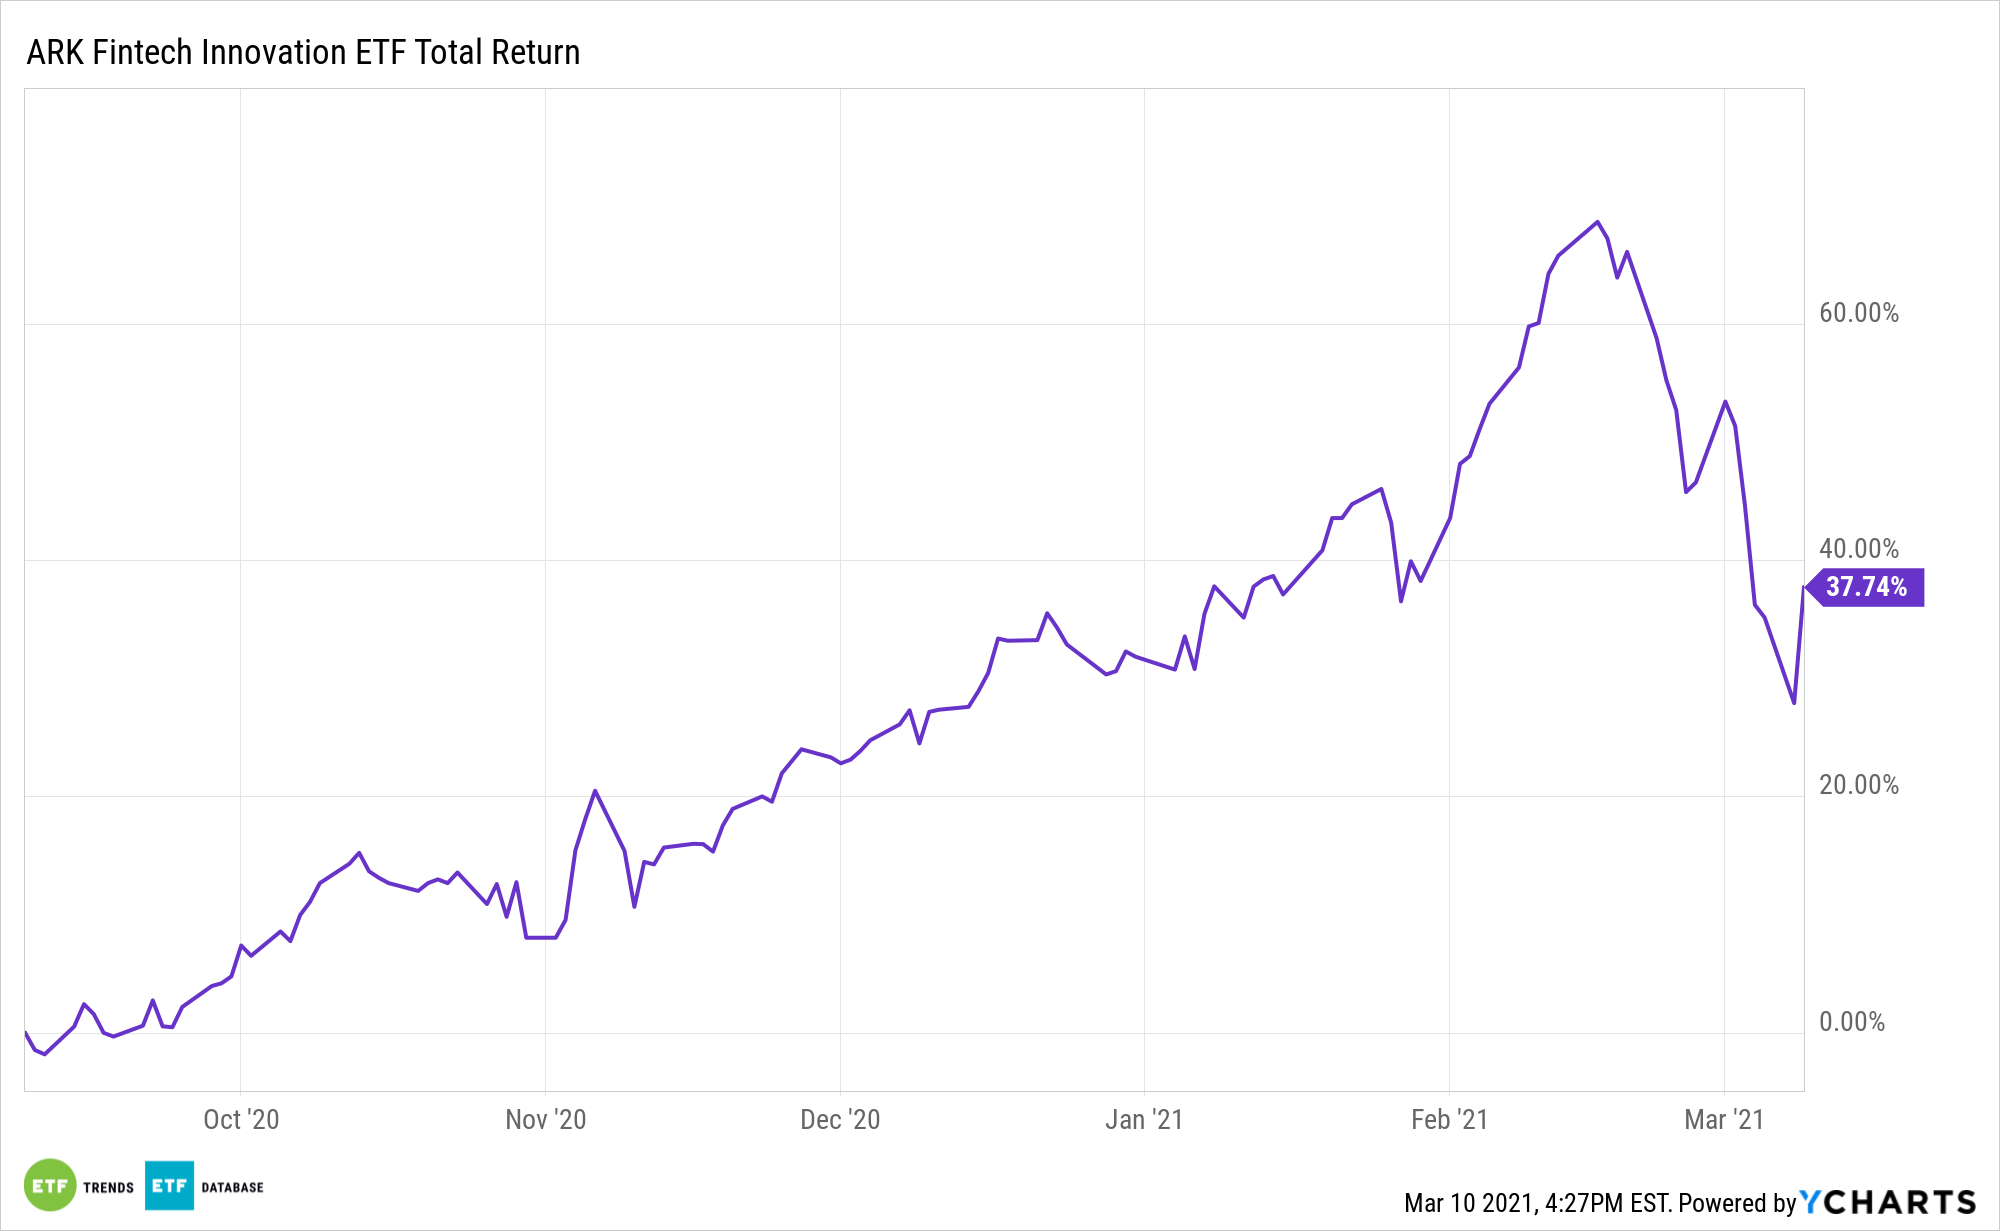 ARKF 6 Month Total Return